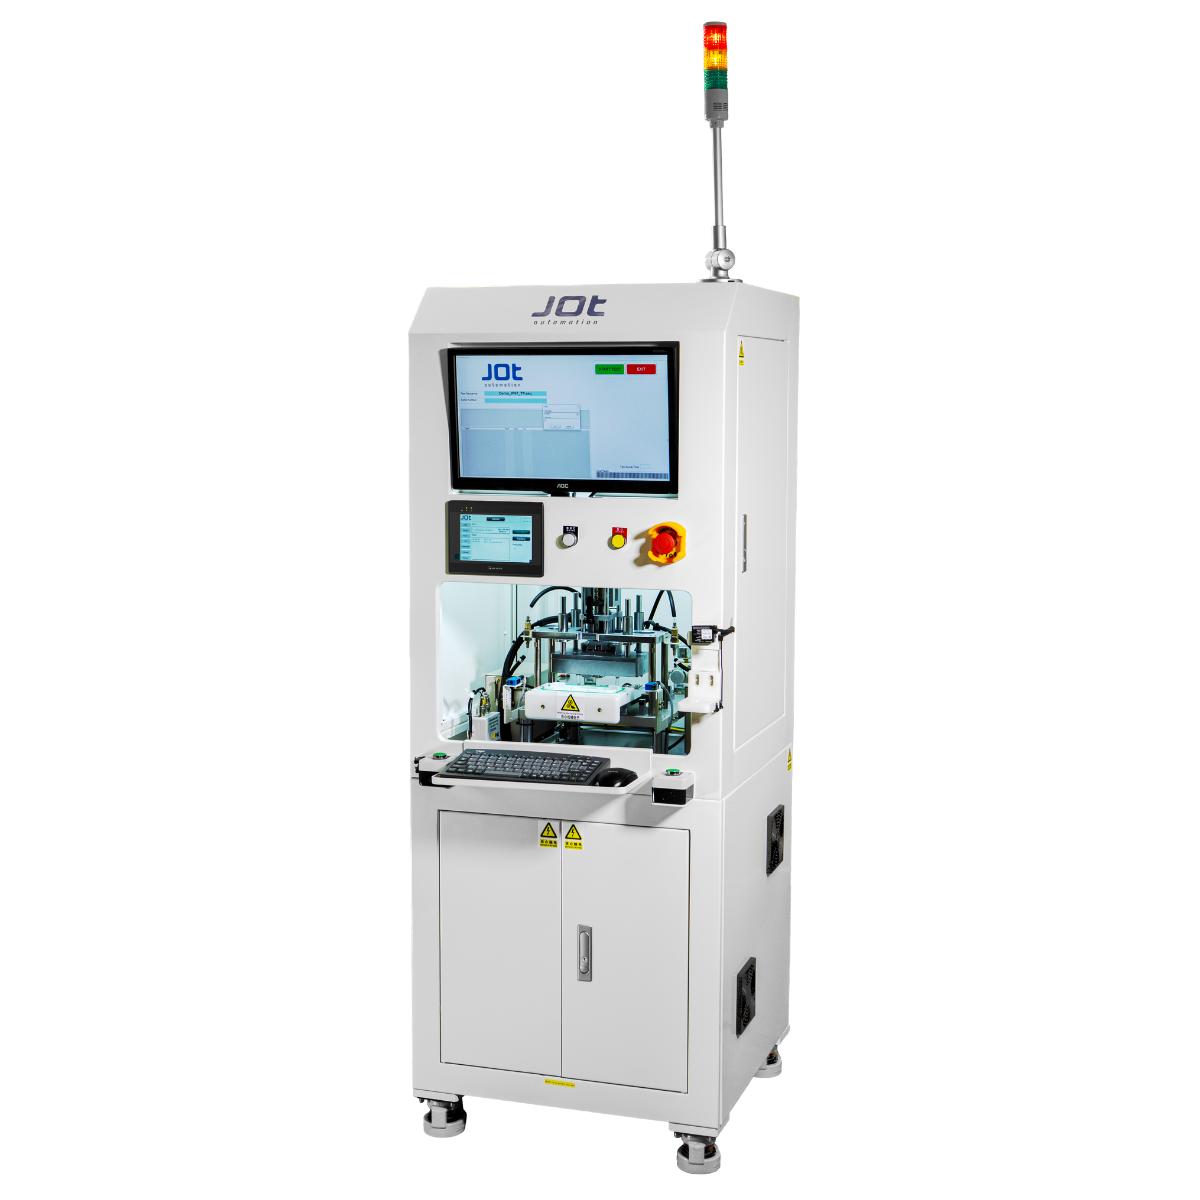 jot-air-leak-tester-productimage-4